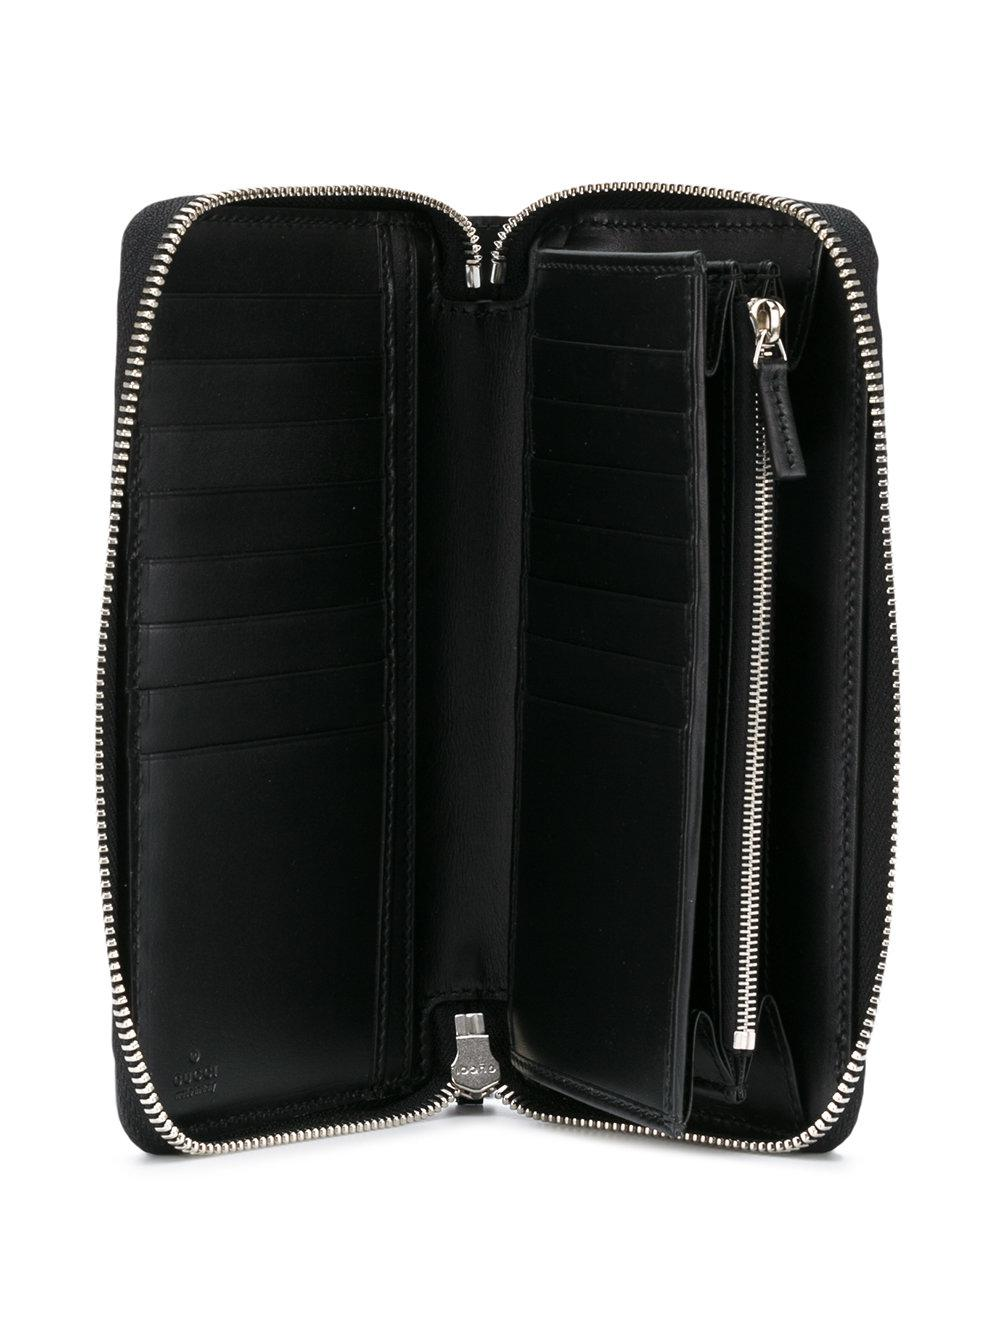 ef8b39832cd Gucci Signature Web Zip-around Wallet in Black for Men - Lyst